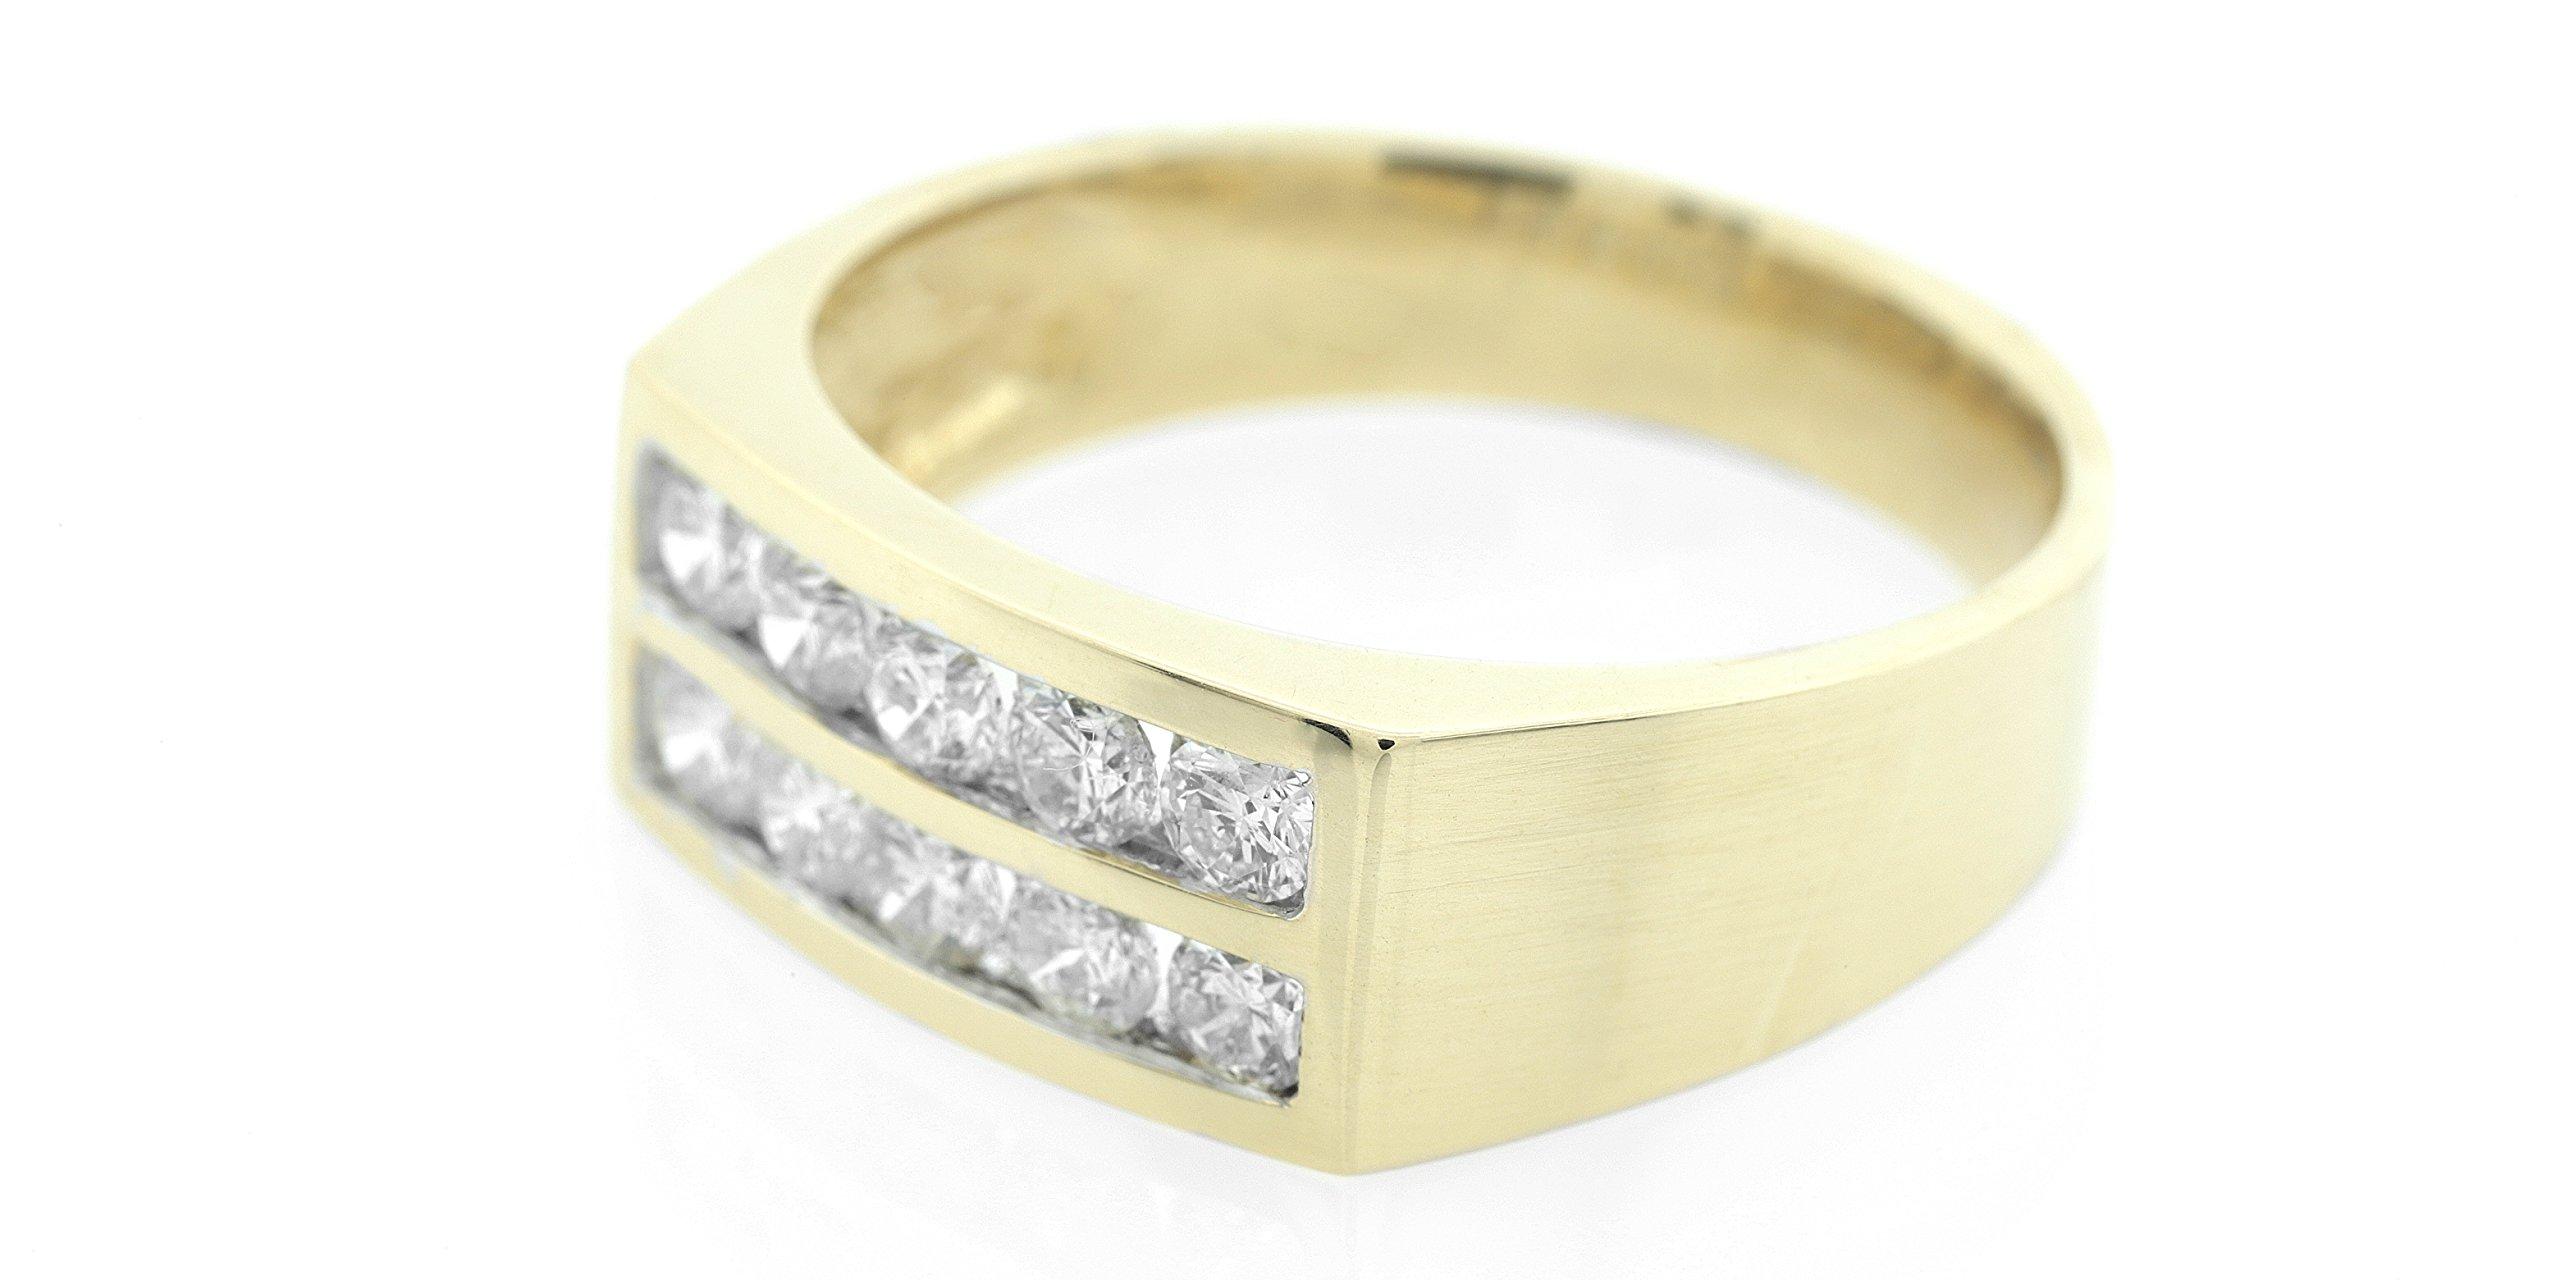 London Fine Jewelry Diamond Double Row Wedding Band in 14K Gold